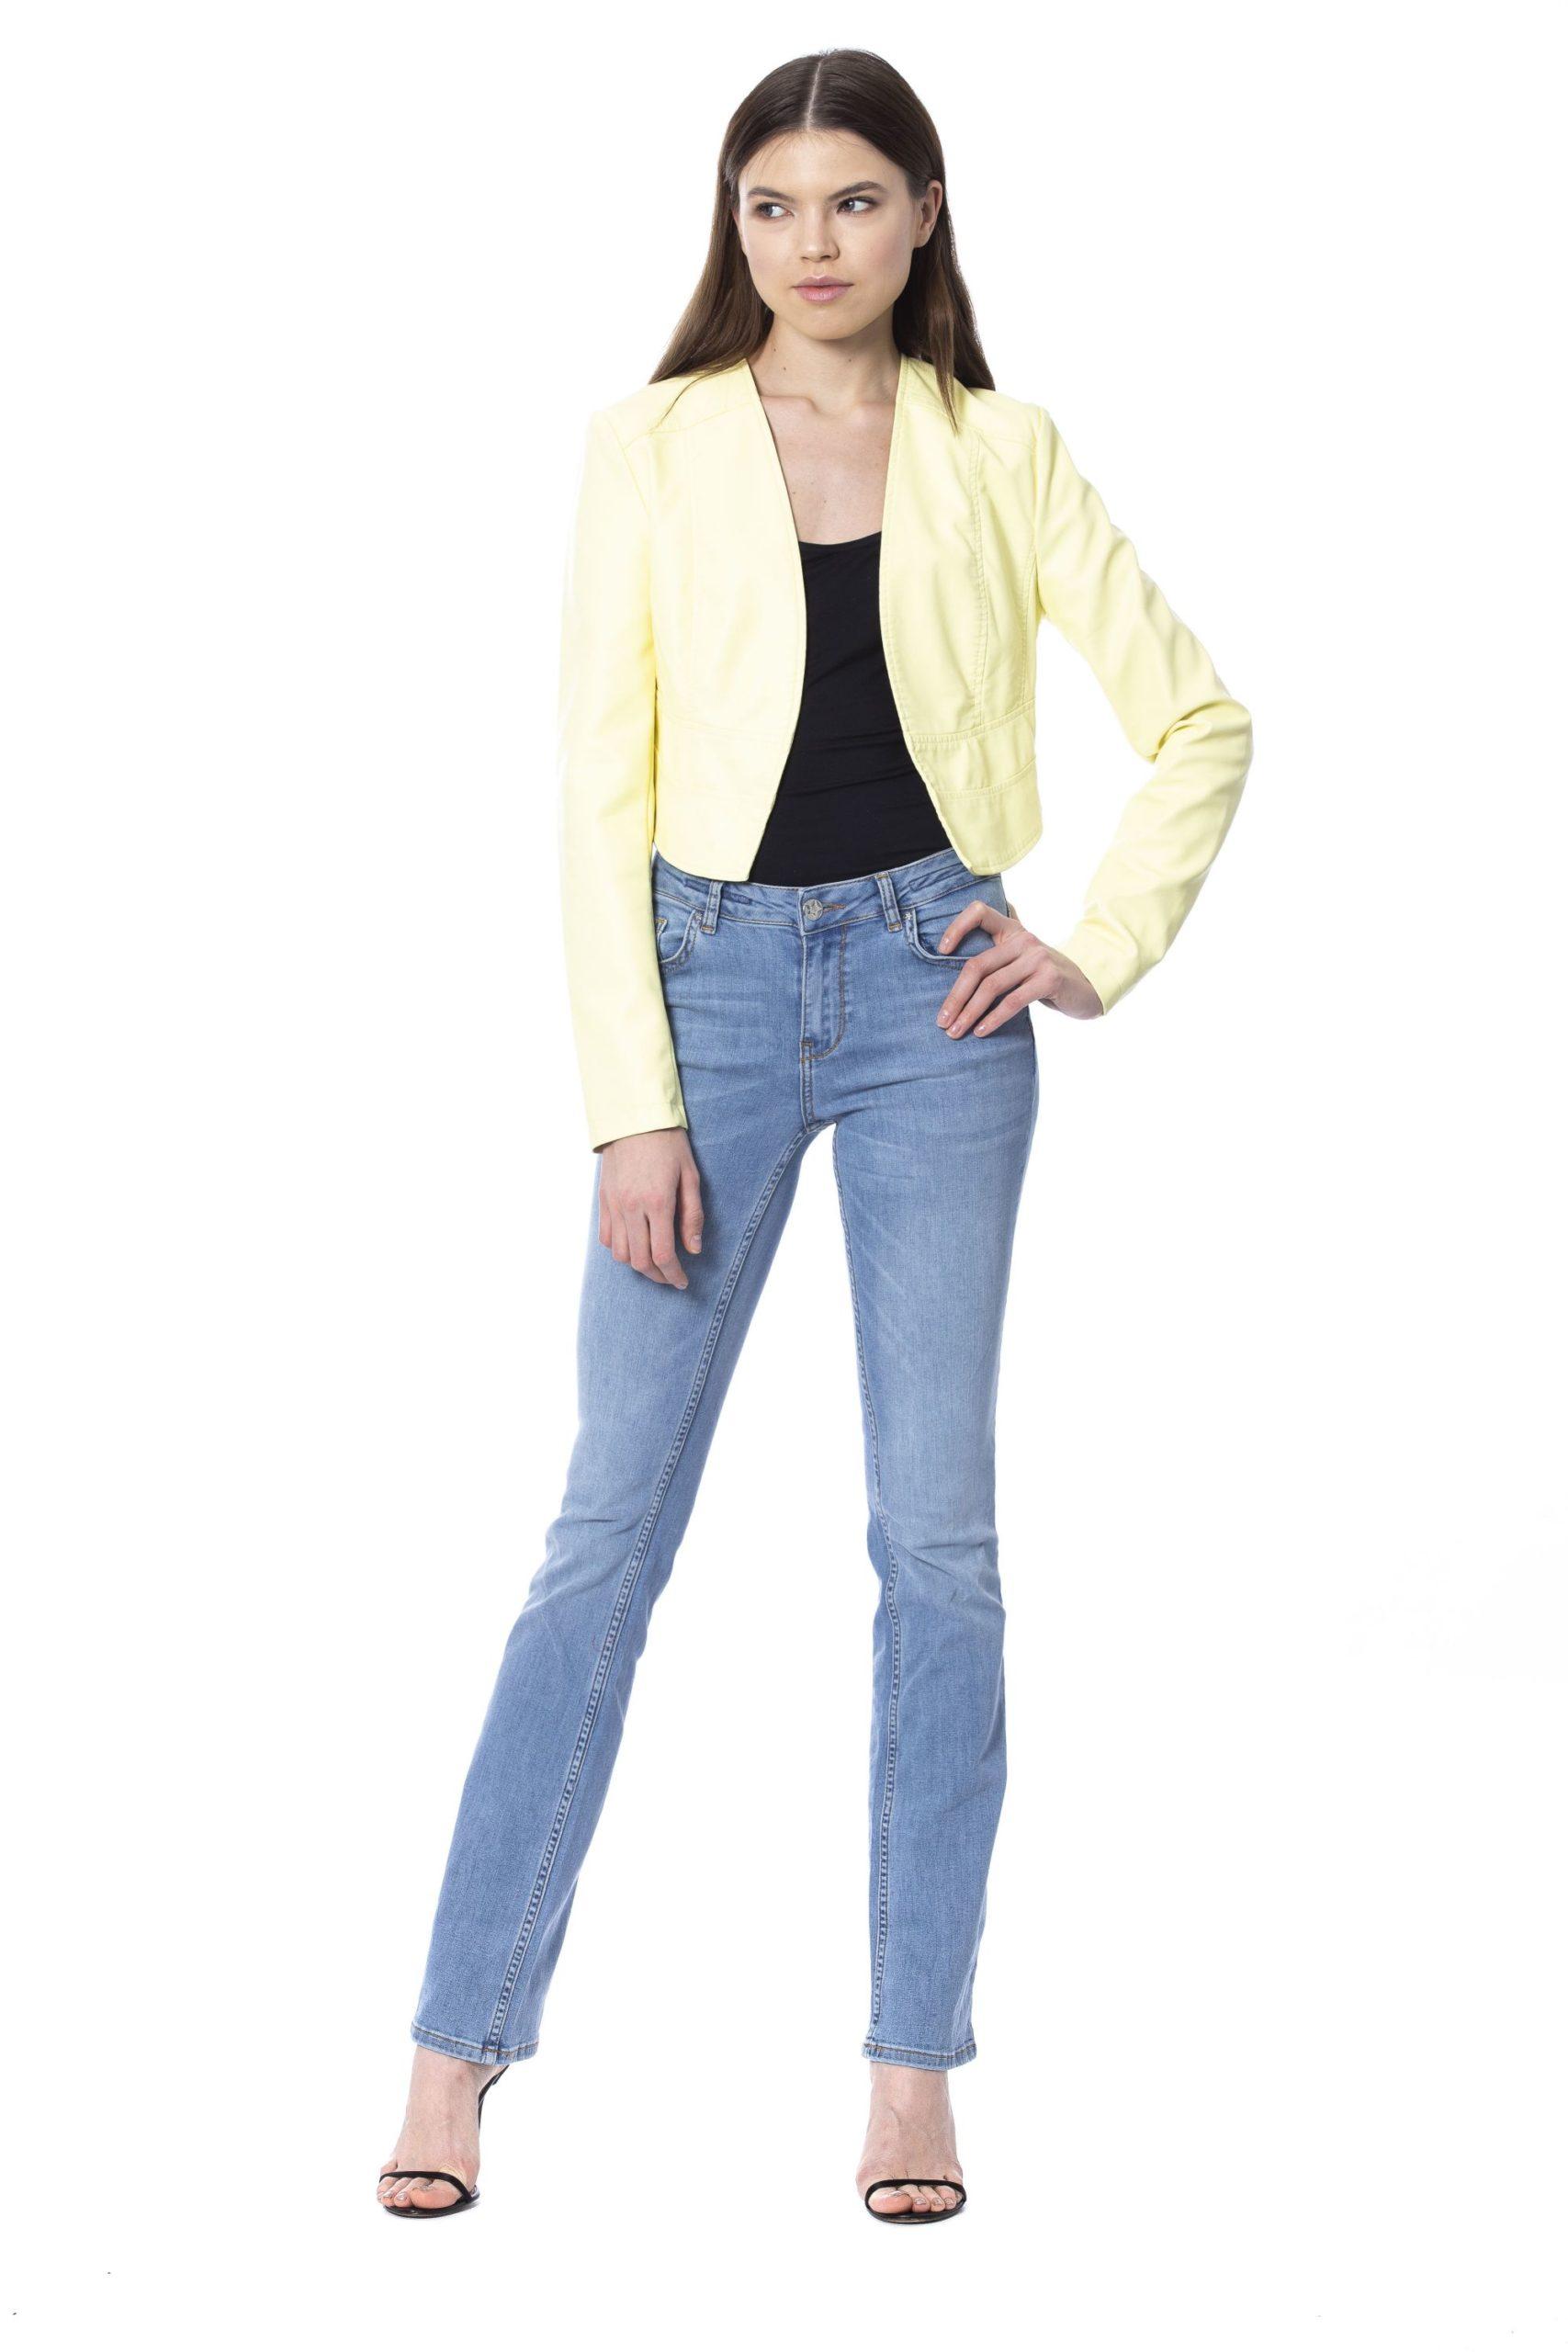 Silvian Heach Women's Jackets Yellow SI993928 - XXS